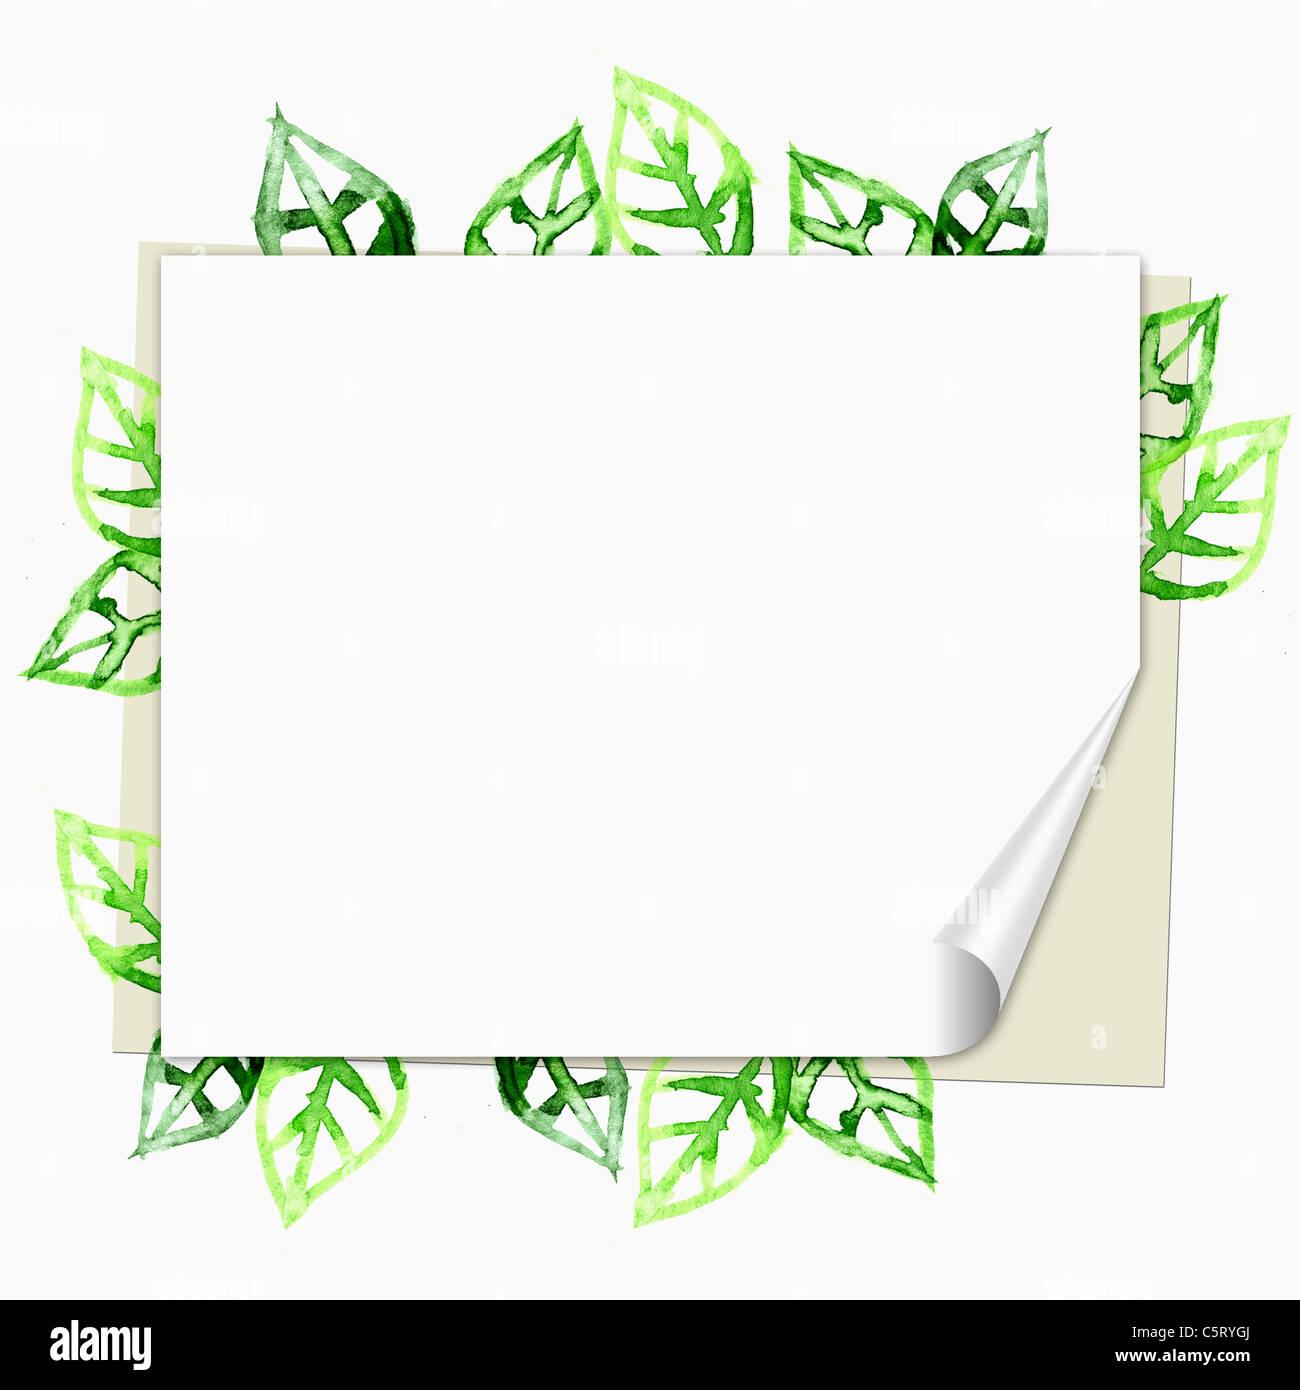 Marcos de hojas verdes Foto & Imagen De Stock: 38020546 - Alamy